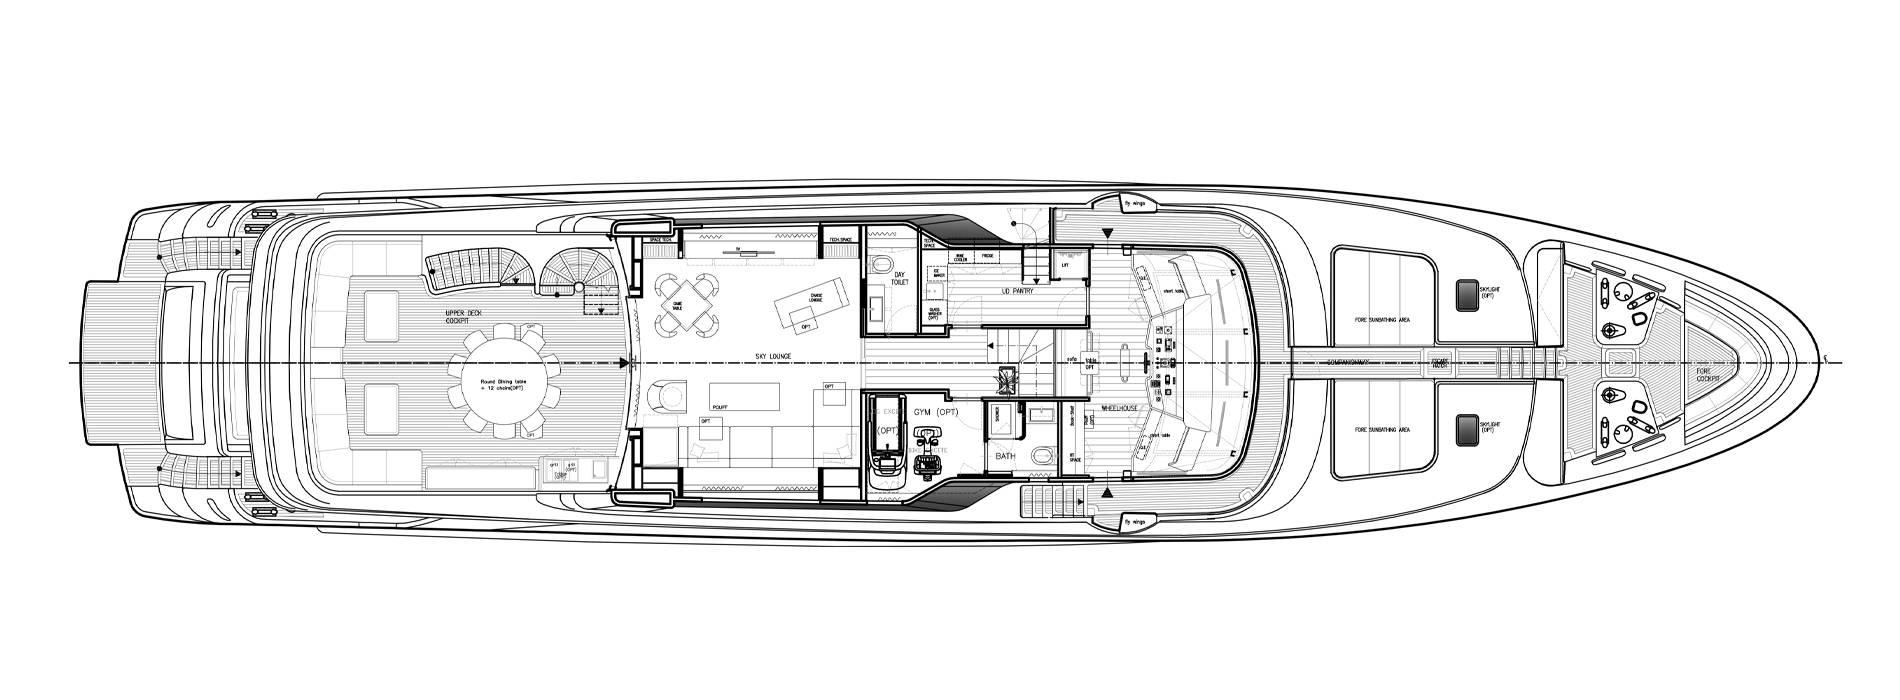 Sanlorenzo Yachts SD122-27 under offer Pont supérieur